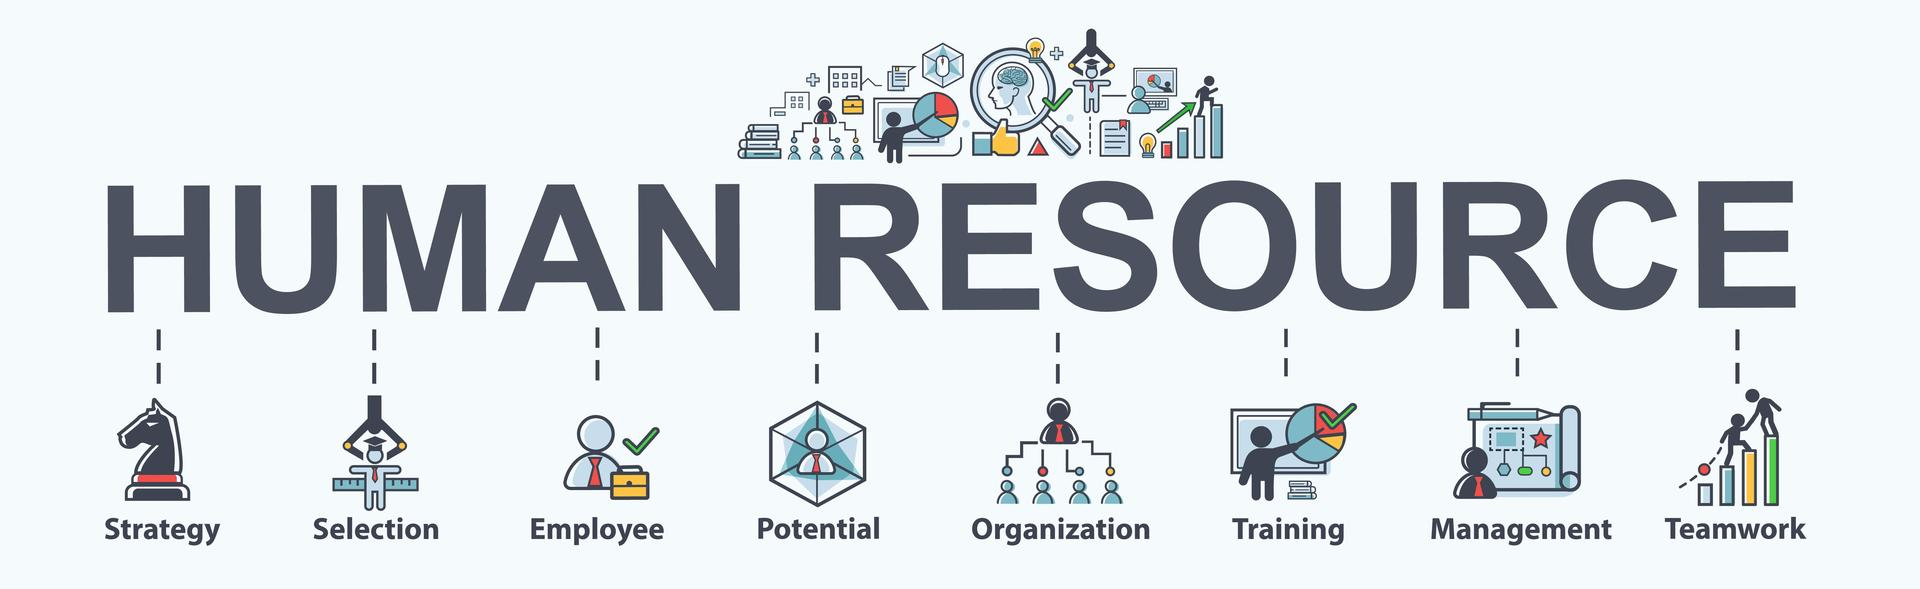 Human Resources chart